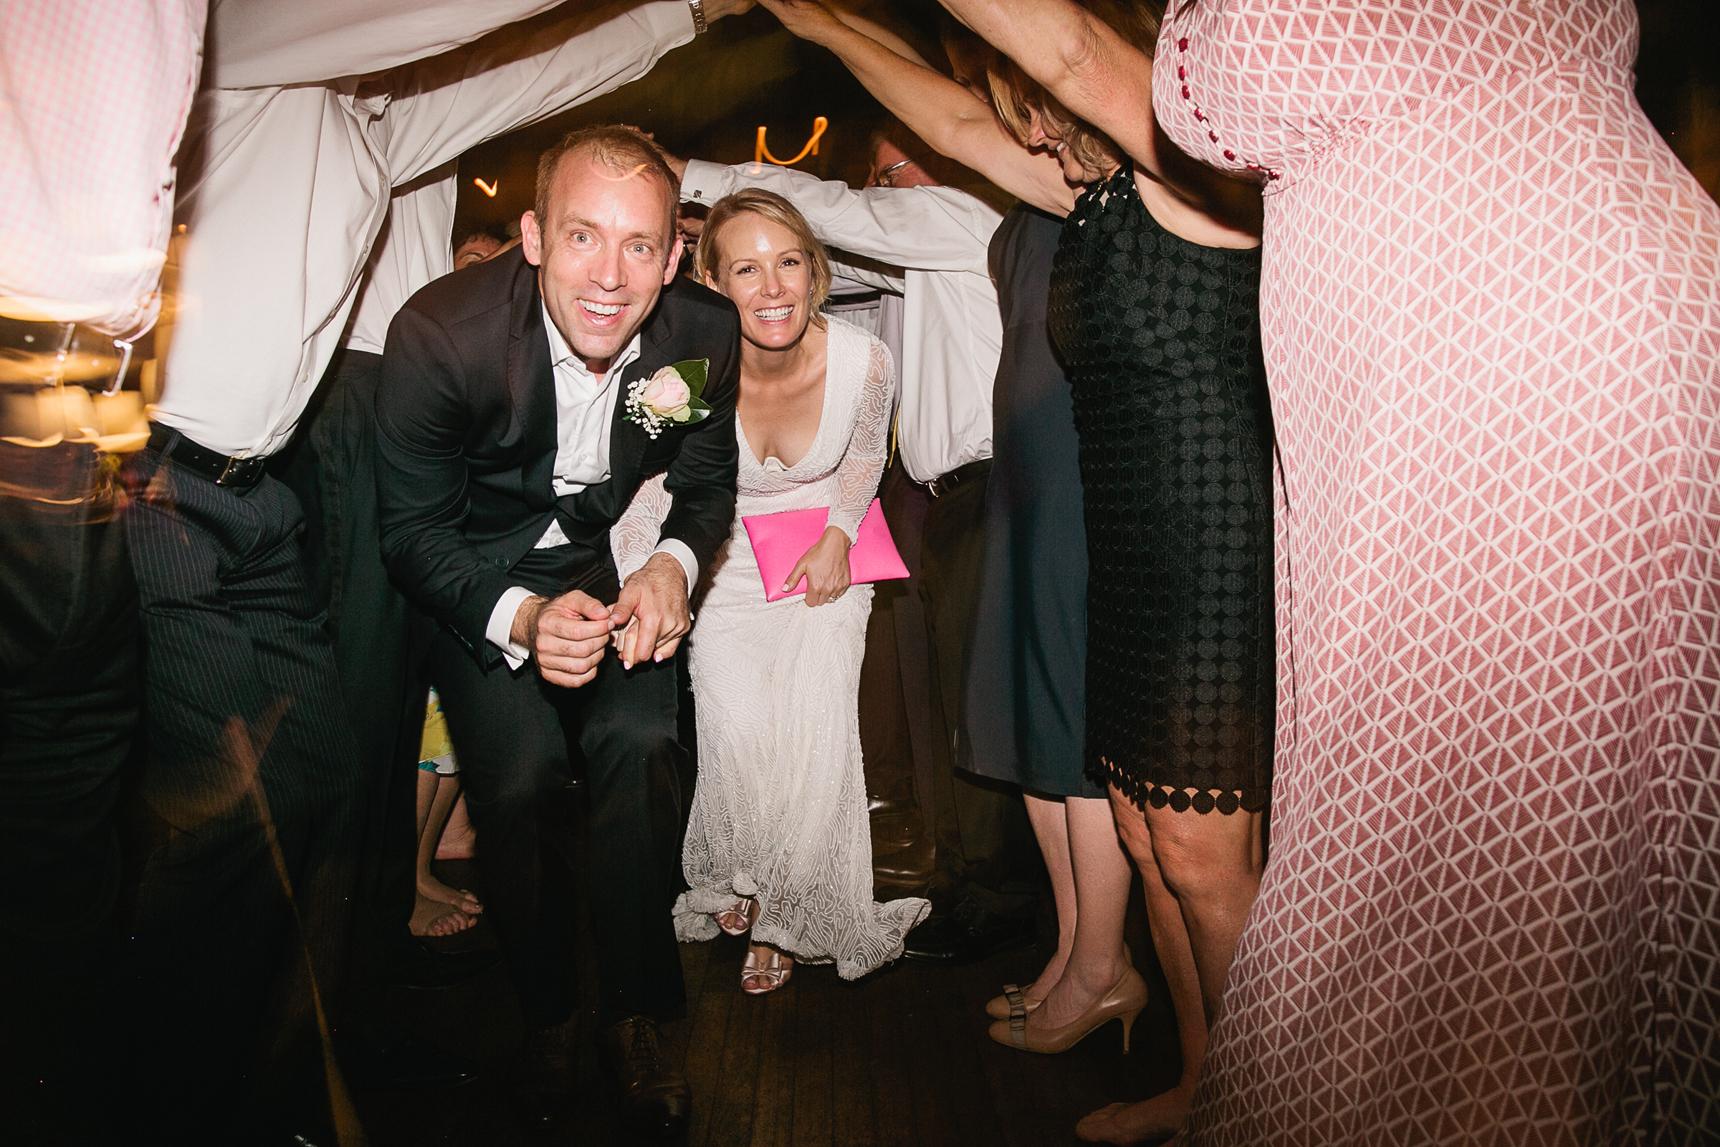 AngeRuss_MobyDicks_WhaleBeach_Wedding_Photography056.jpg